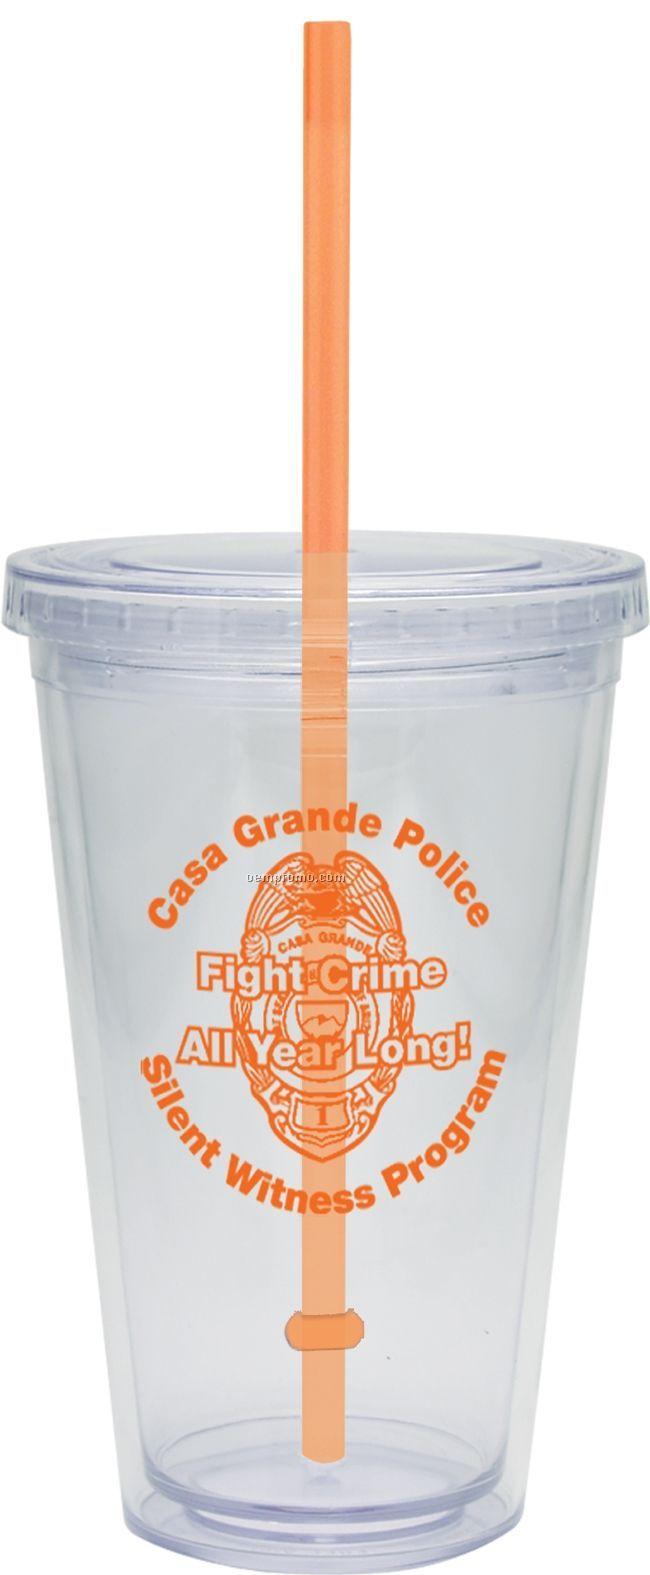 20 Oz. Carnival Cup W/ Orange Straw